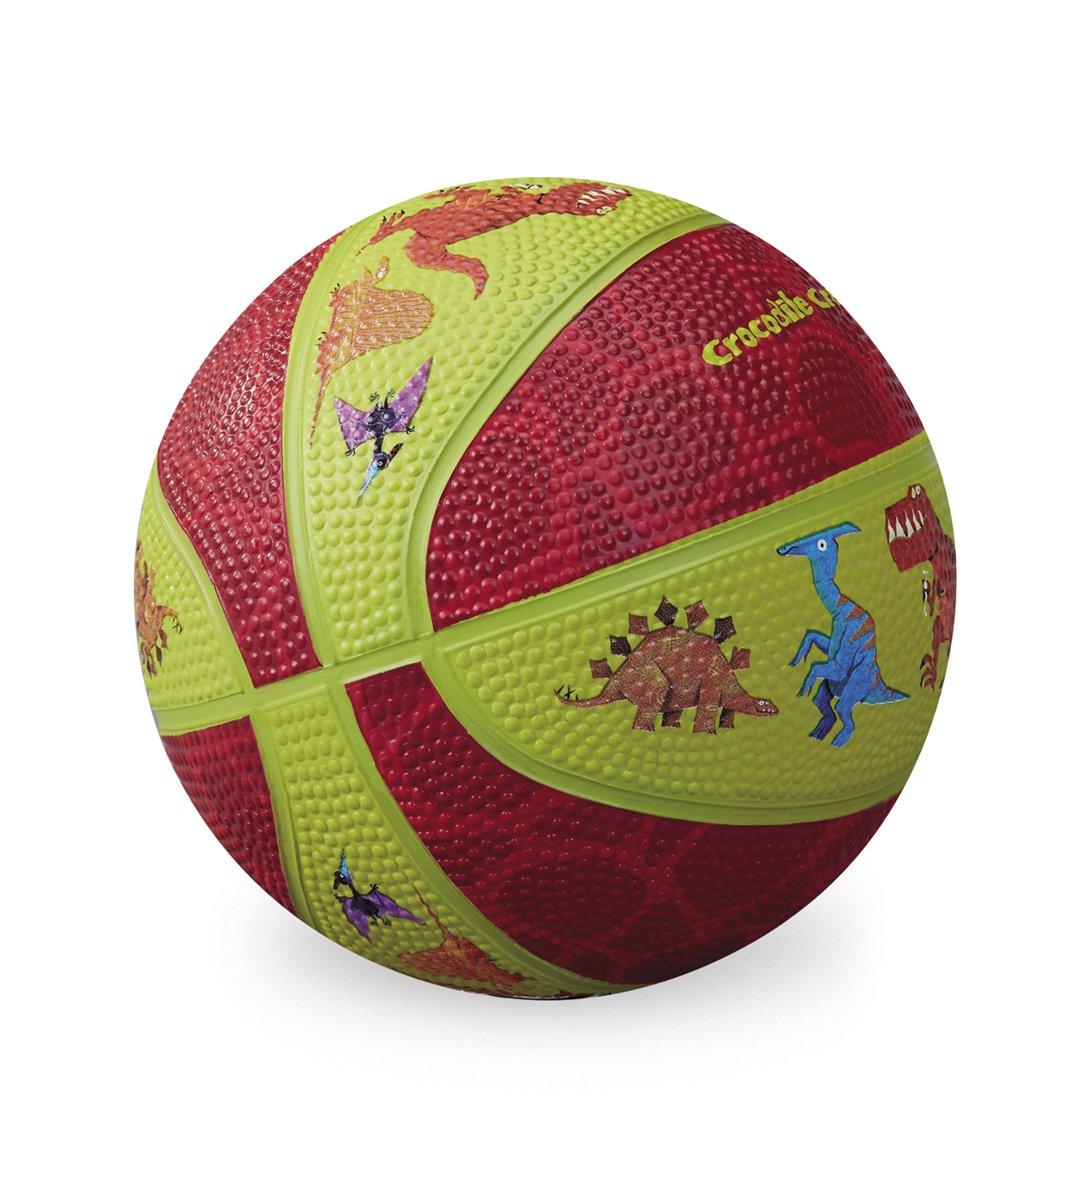 Crocodile Creek Dinosaurs Kid-Sized Basketball, Lime Green/Red, 5.5''